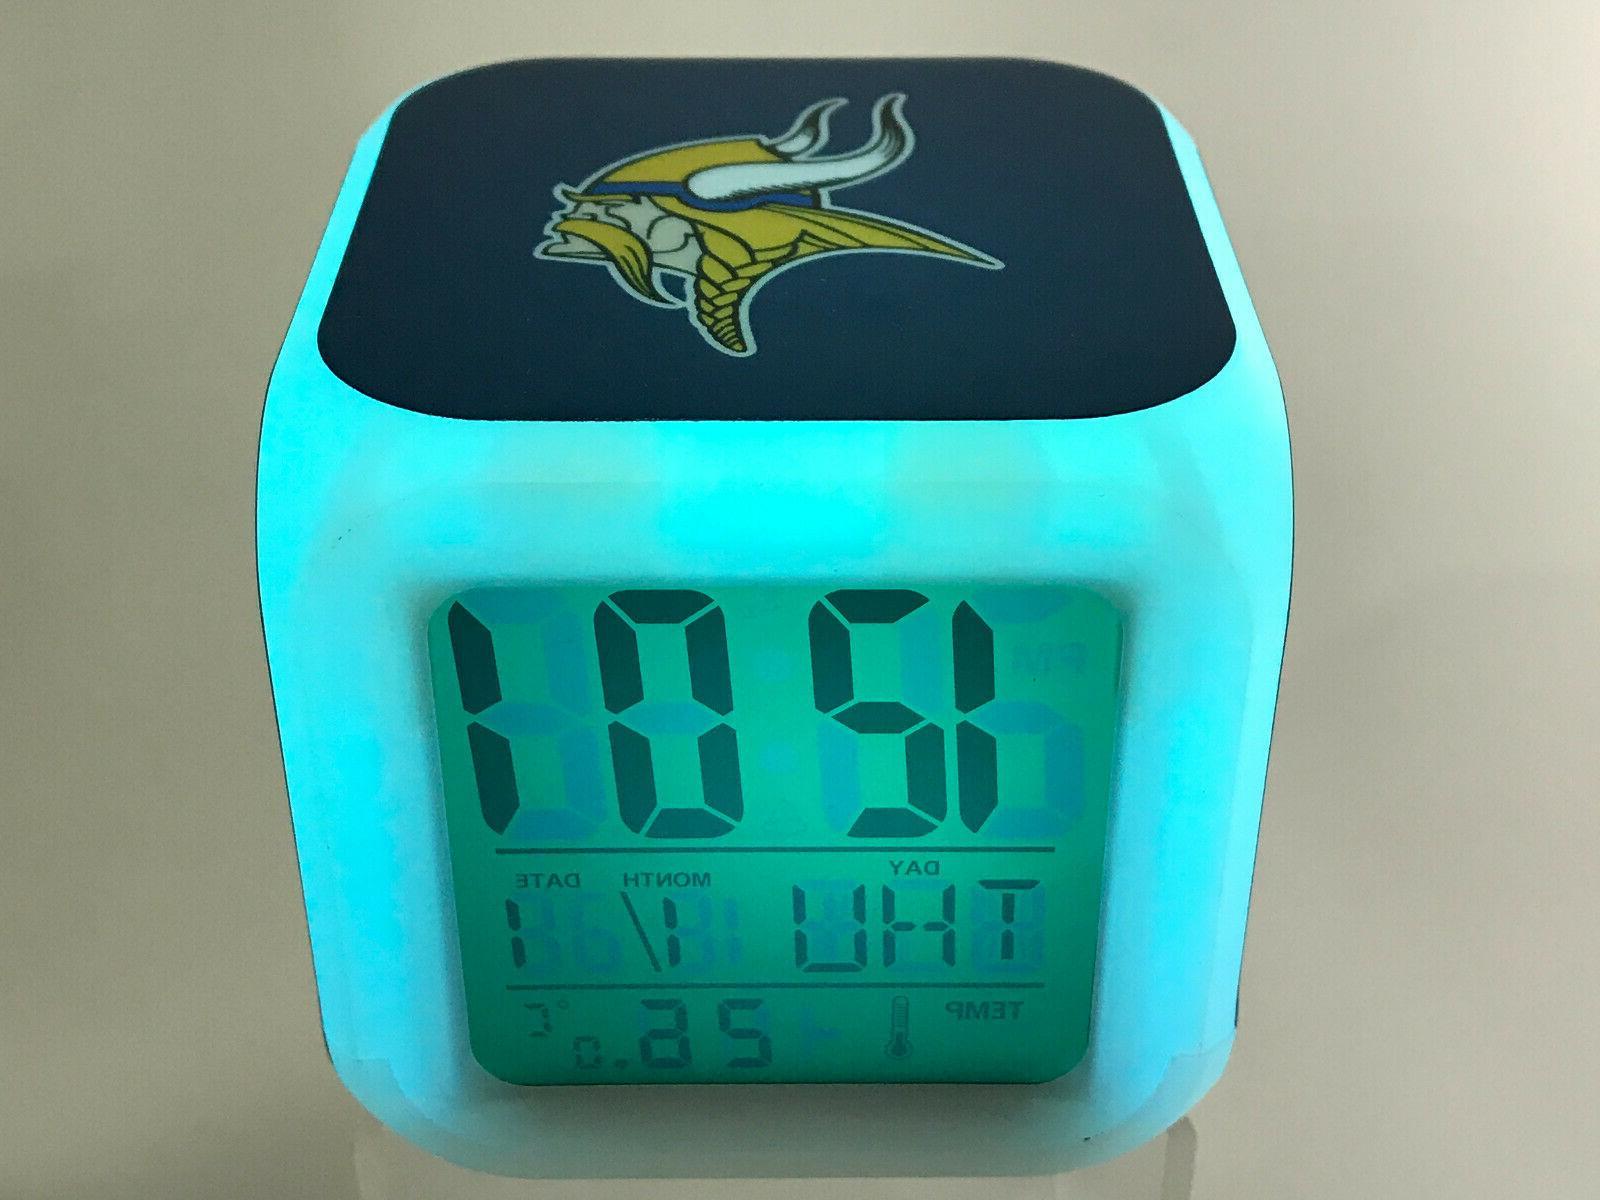 Minnesota LED Digital Alarm Lamp Decor Gift